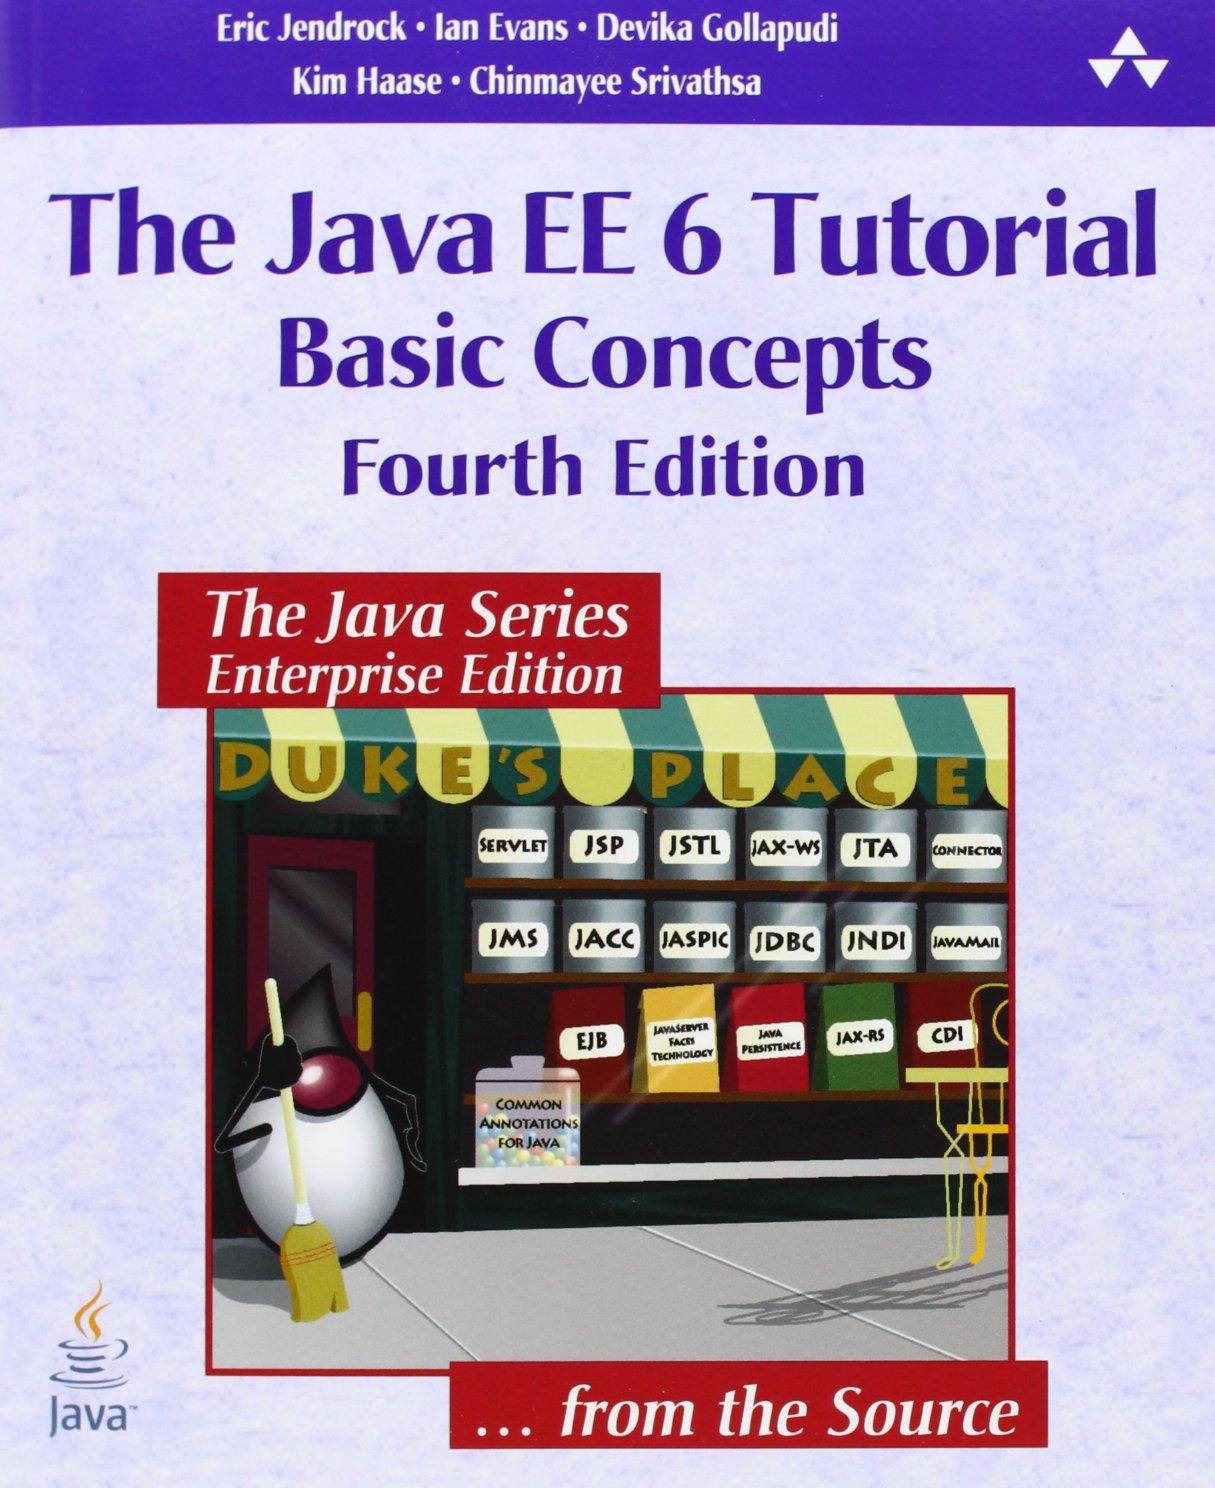 Java ee 6 tutorial pdf gallery any tutorial examples the java ee 6 tutorial basic concepts java series amazon the java ee 6 tutorial basic baditri Gallery